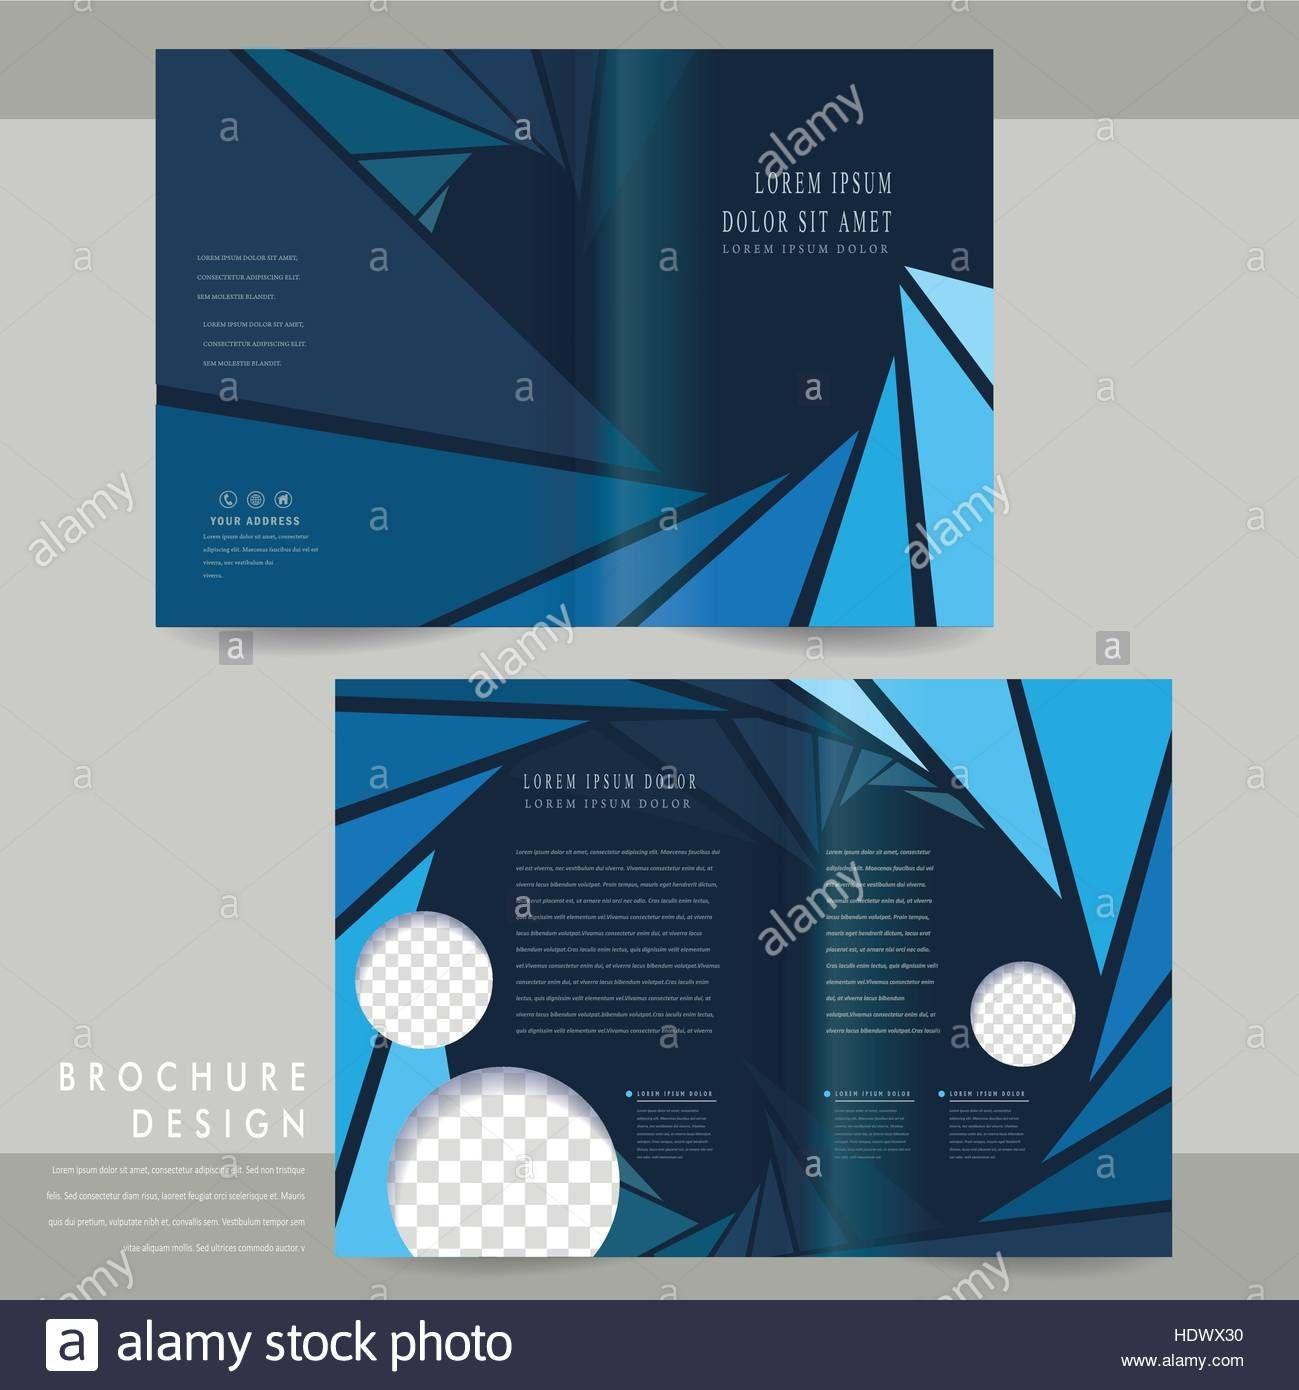 Modern Half Fold Brochure Template Design In Blue Stock Throughout Half Fold Card Template Brochure Design Template Brochure Template Free Brochure Template